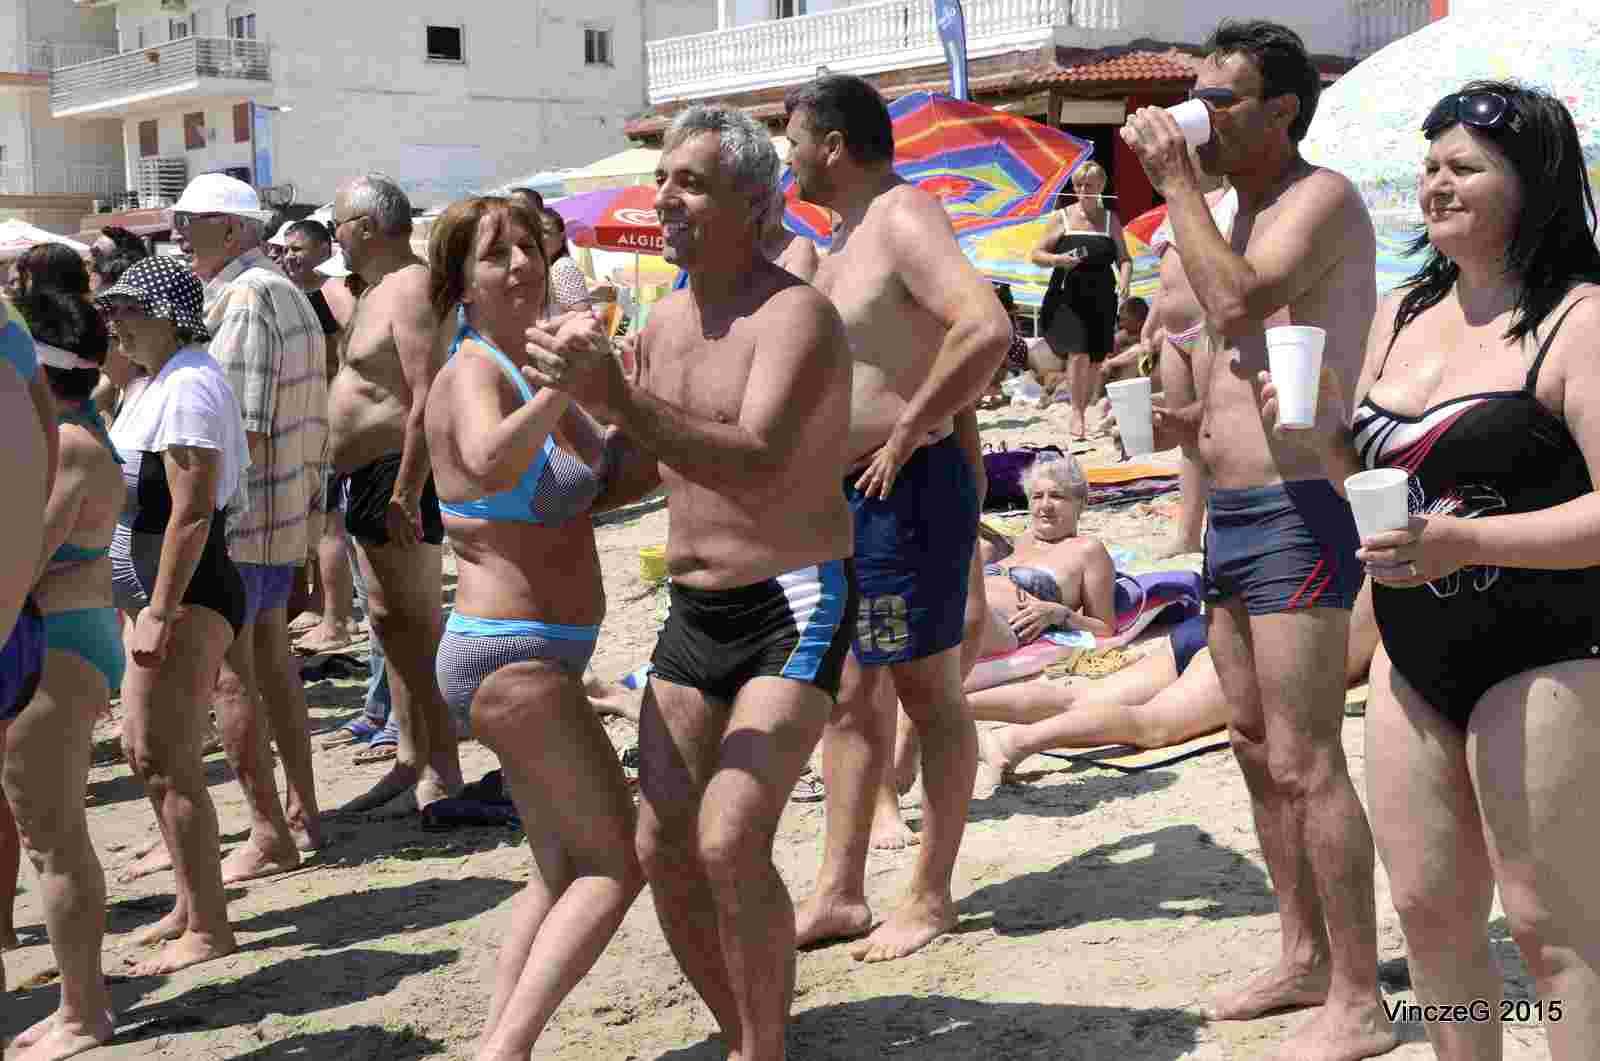 free dating sites uk no fees caut femeie din subotica